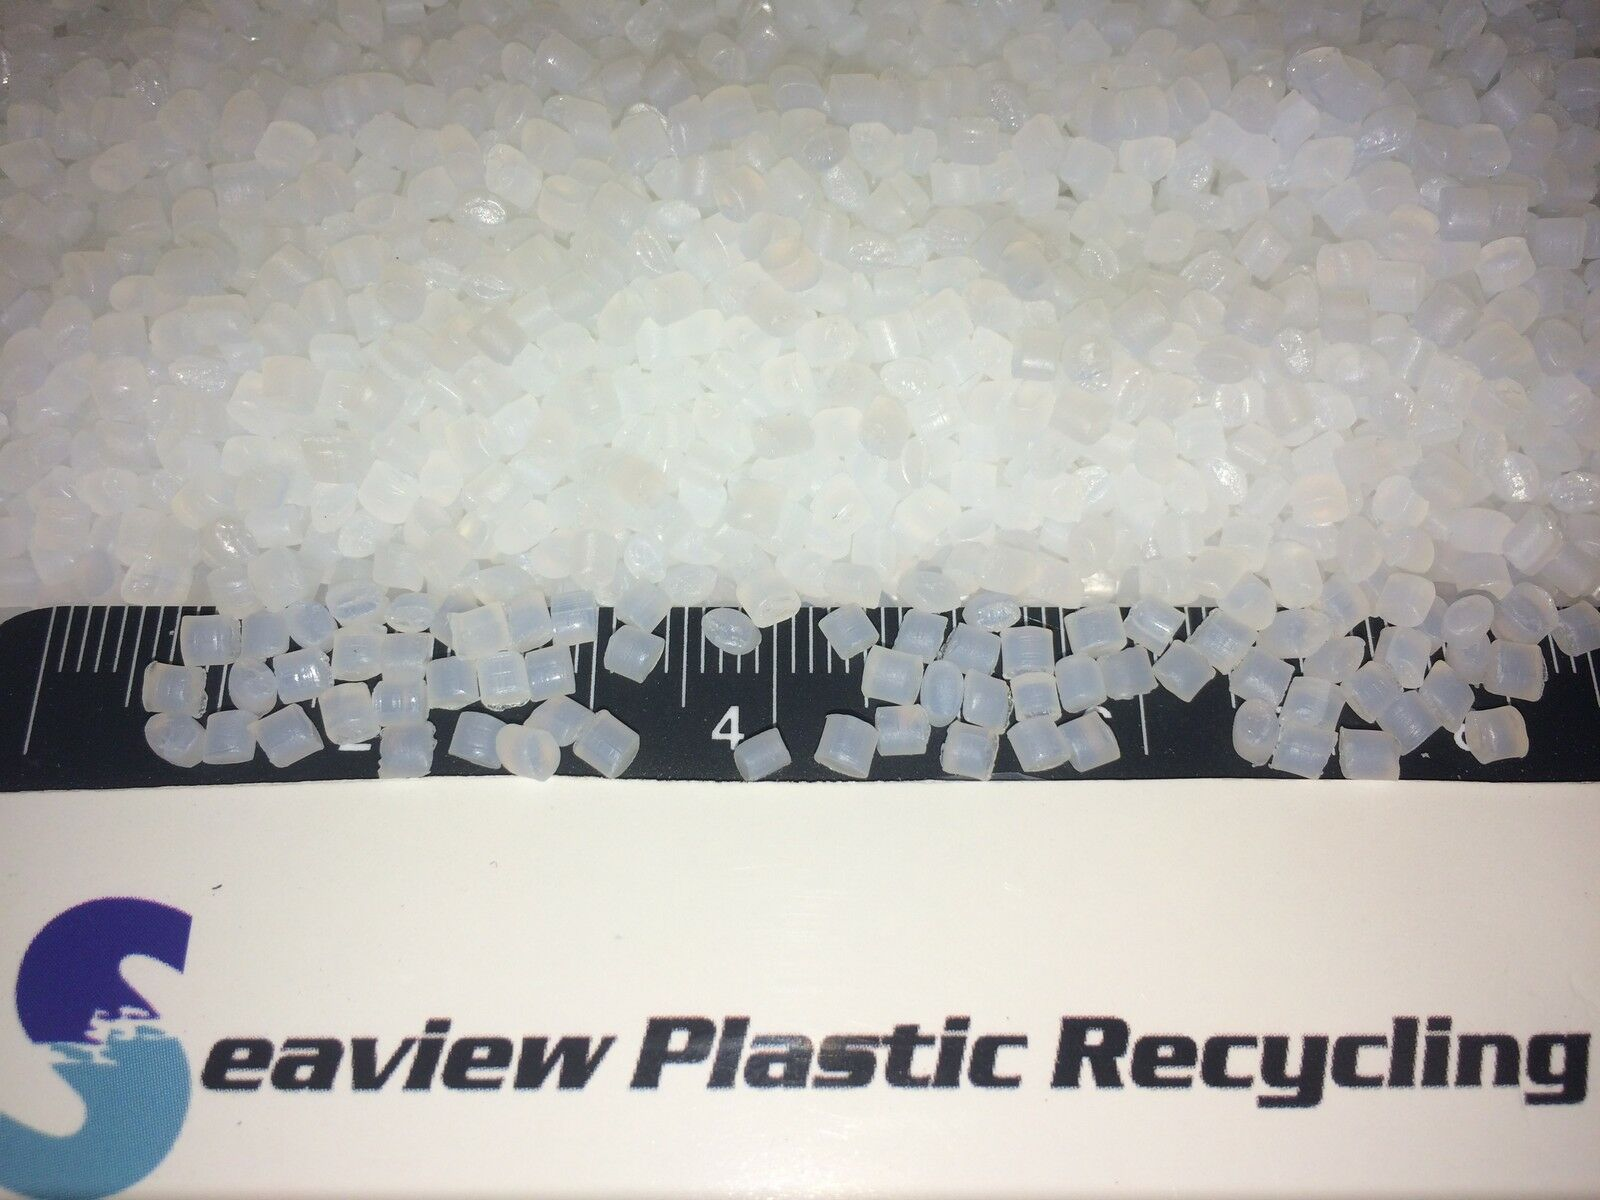 Seaview Plastic Recycling, Inc.